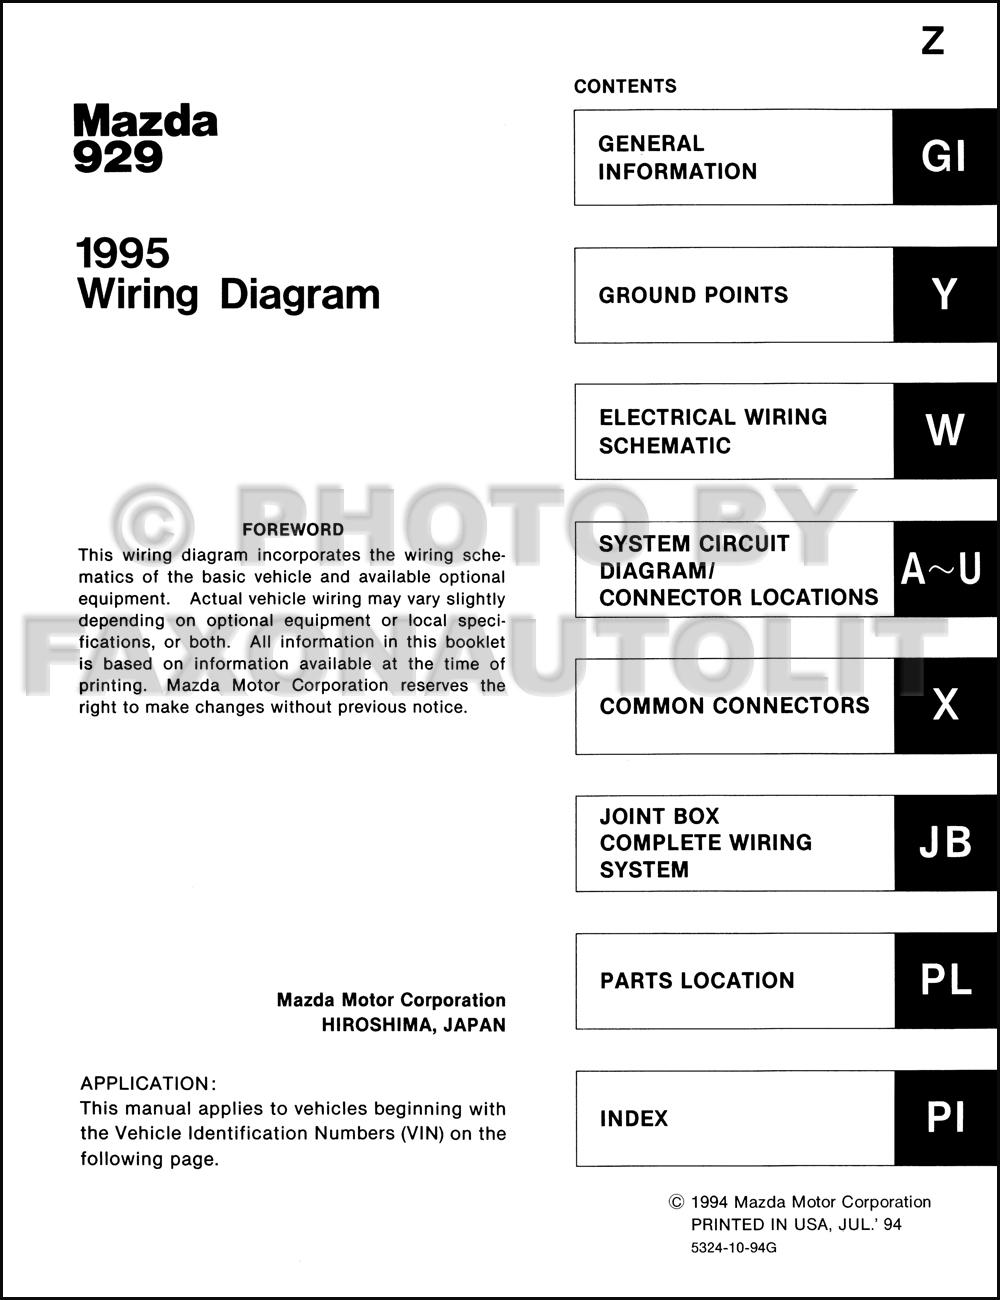 1995 mazda 929 wiring diagram manual original 2003 mazda 6 wiring diagram manual mazda 929 wiring diagram